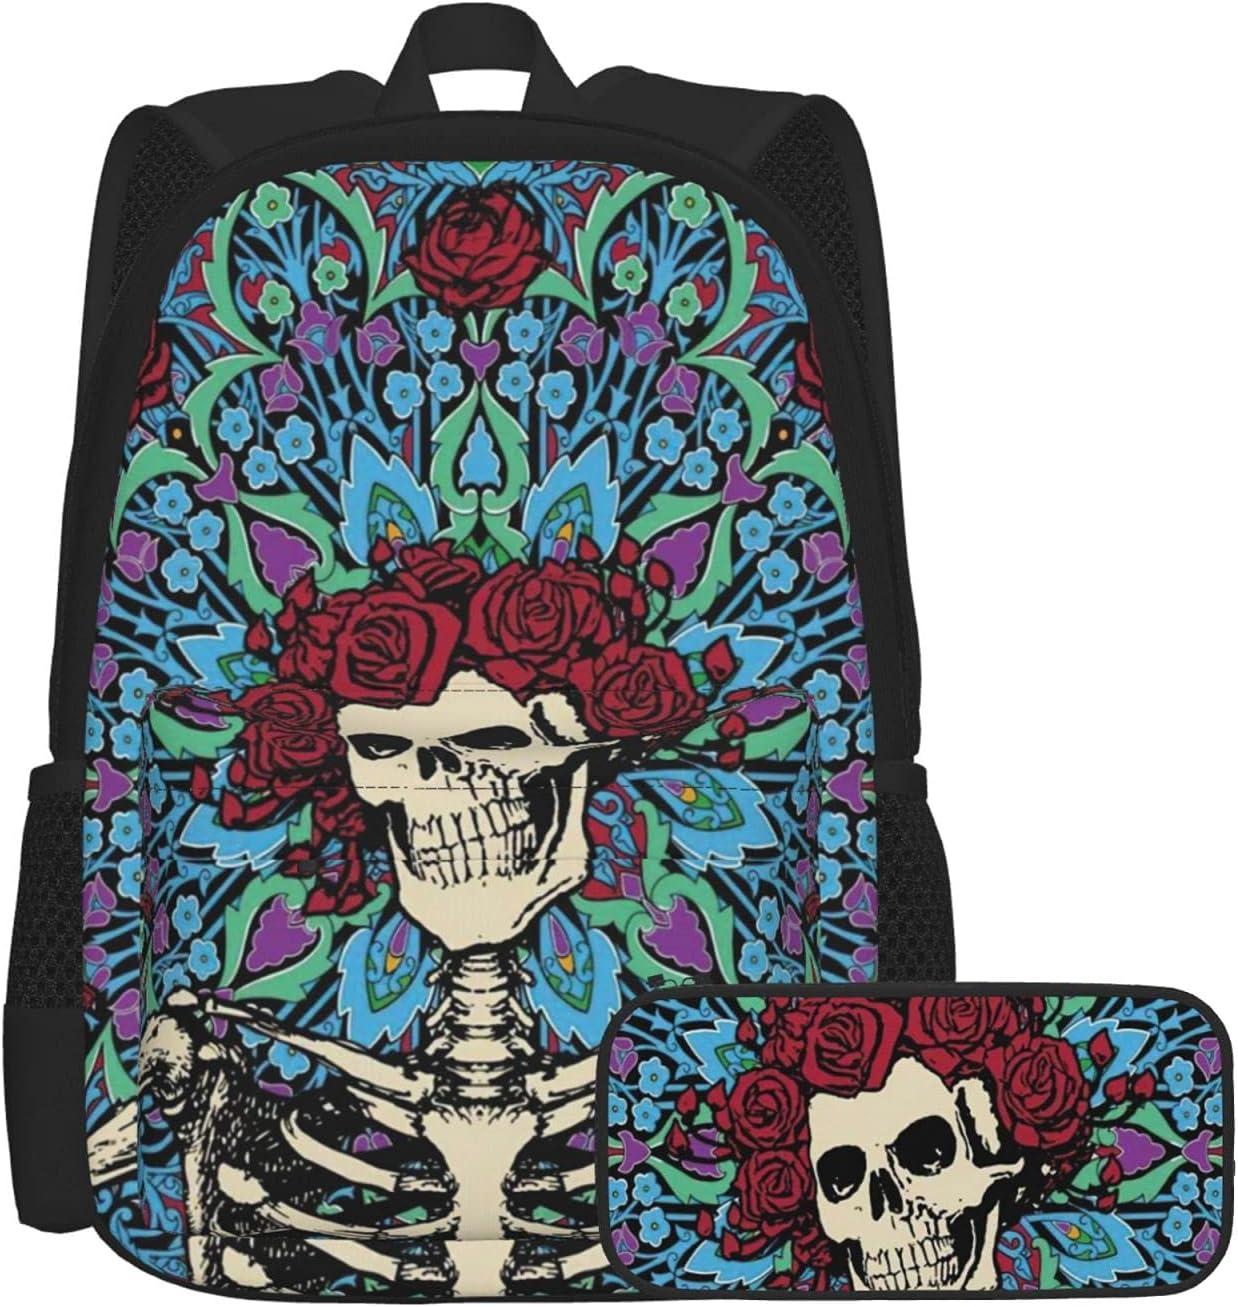 Limited price sale Direct sale of manufacturer Retro Skull Flower Pattern Unisex For Boys Backpack School Schoo